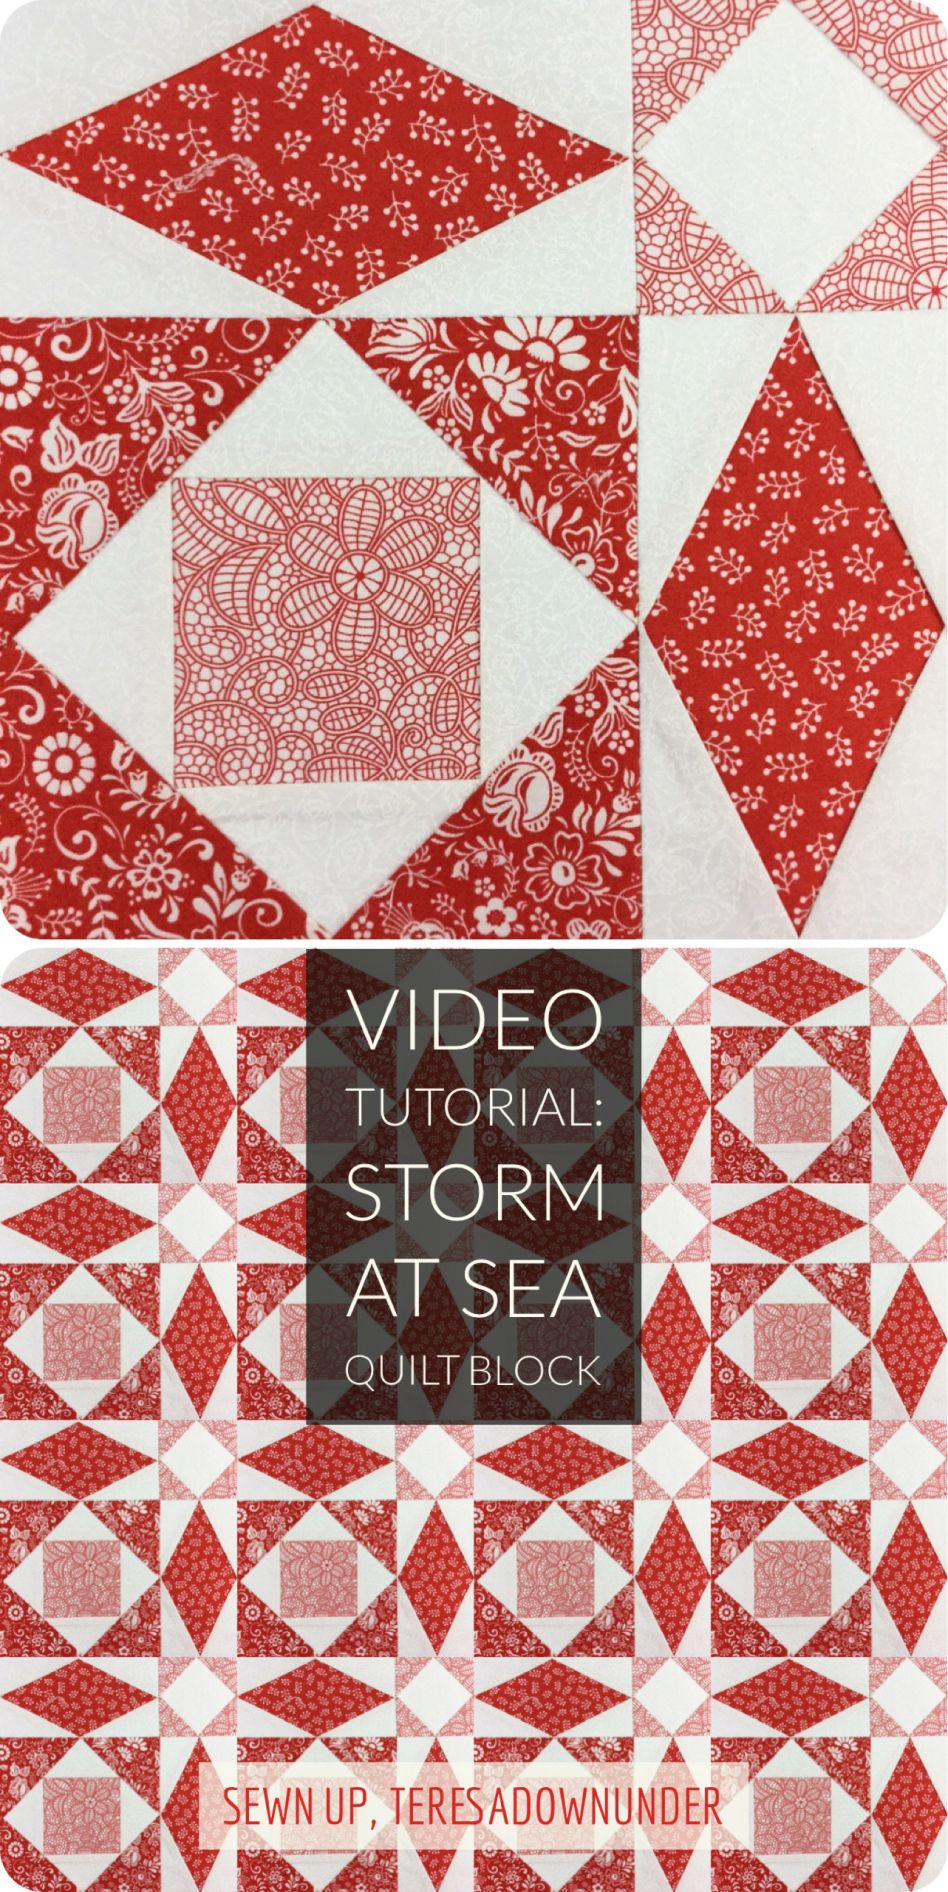 storm at sea quilt template - video tutorial storm at sea quilt block version 1